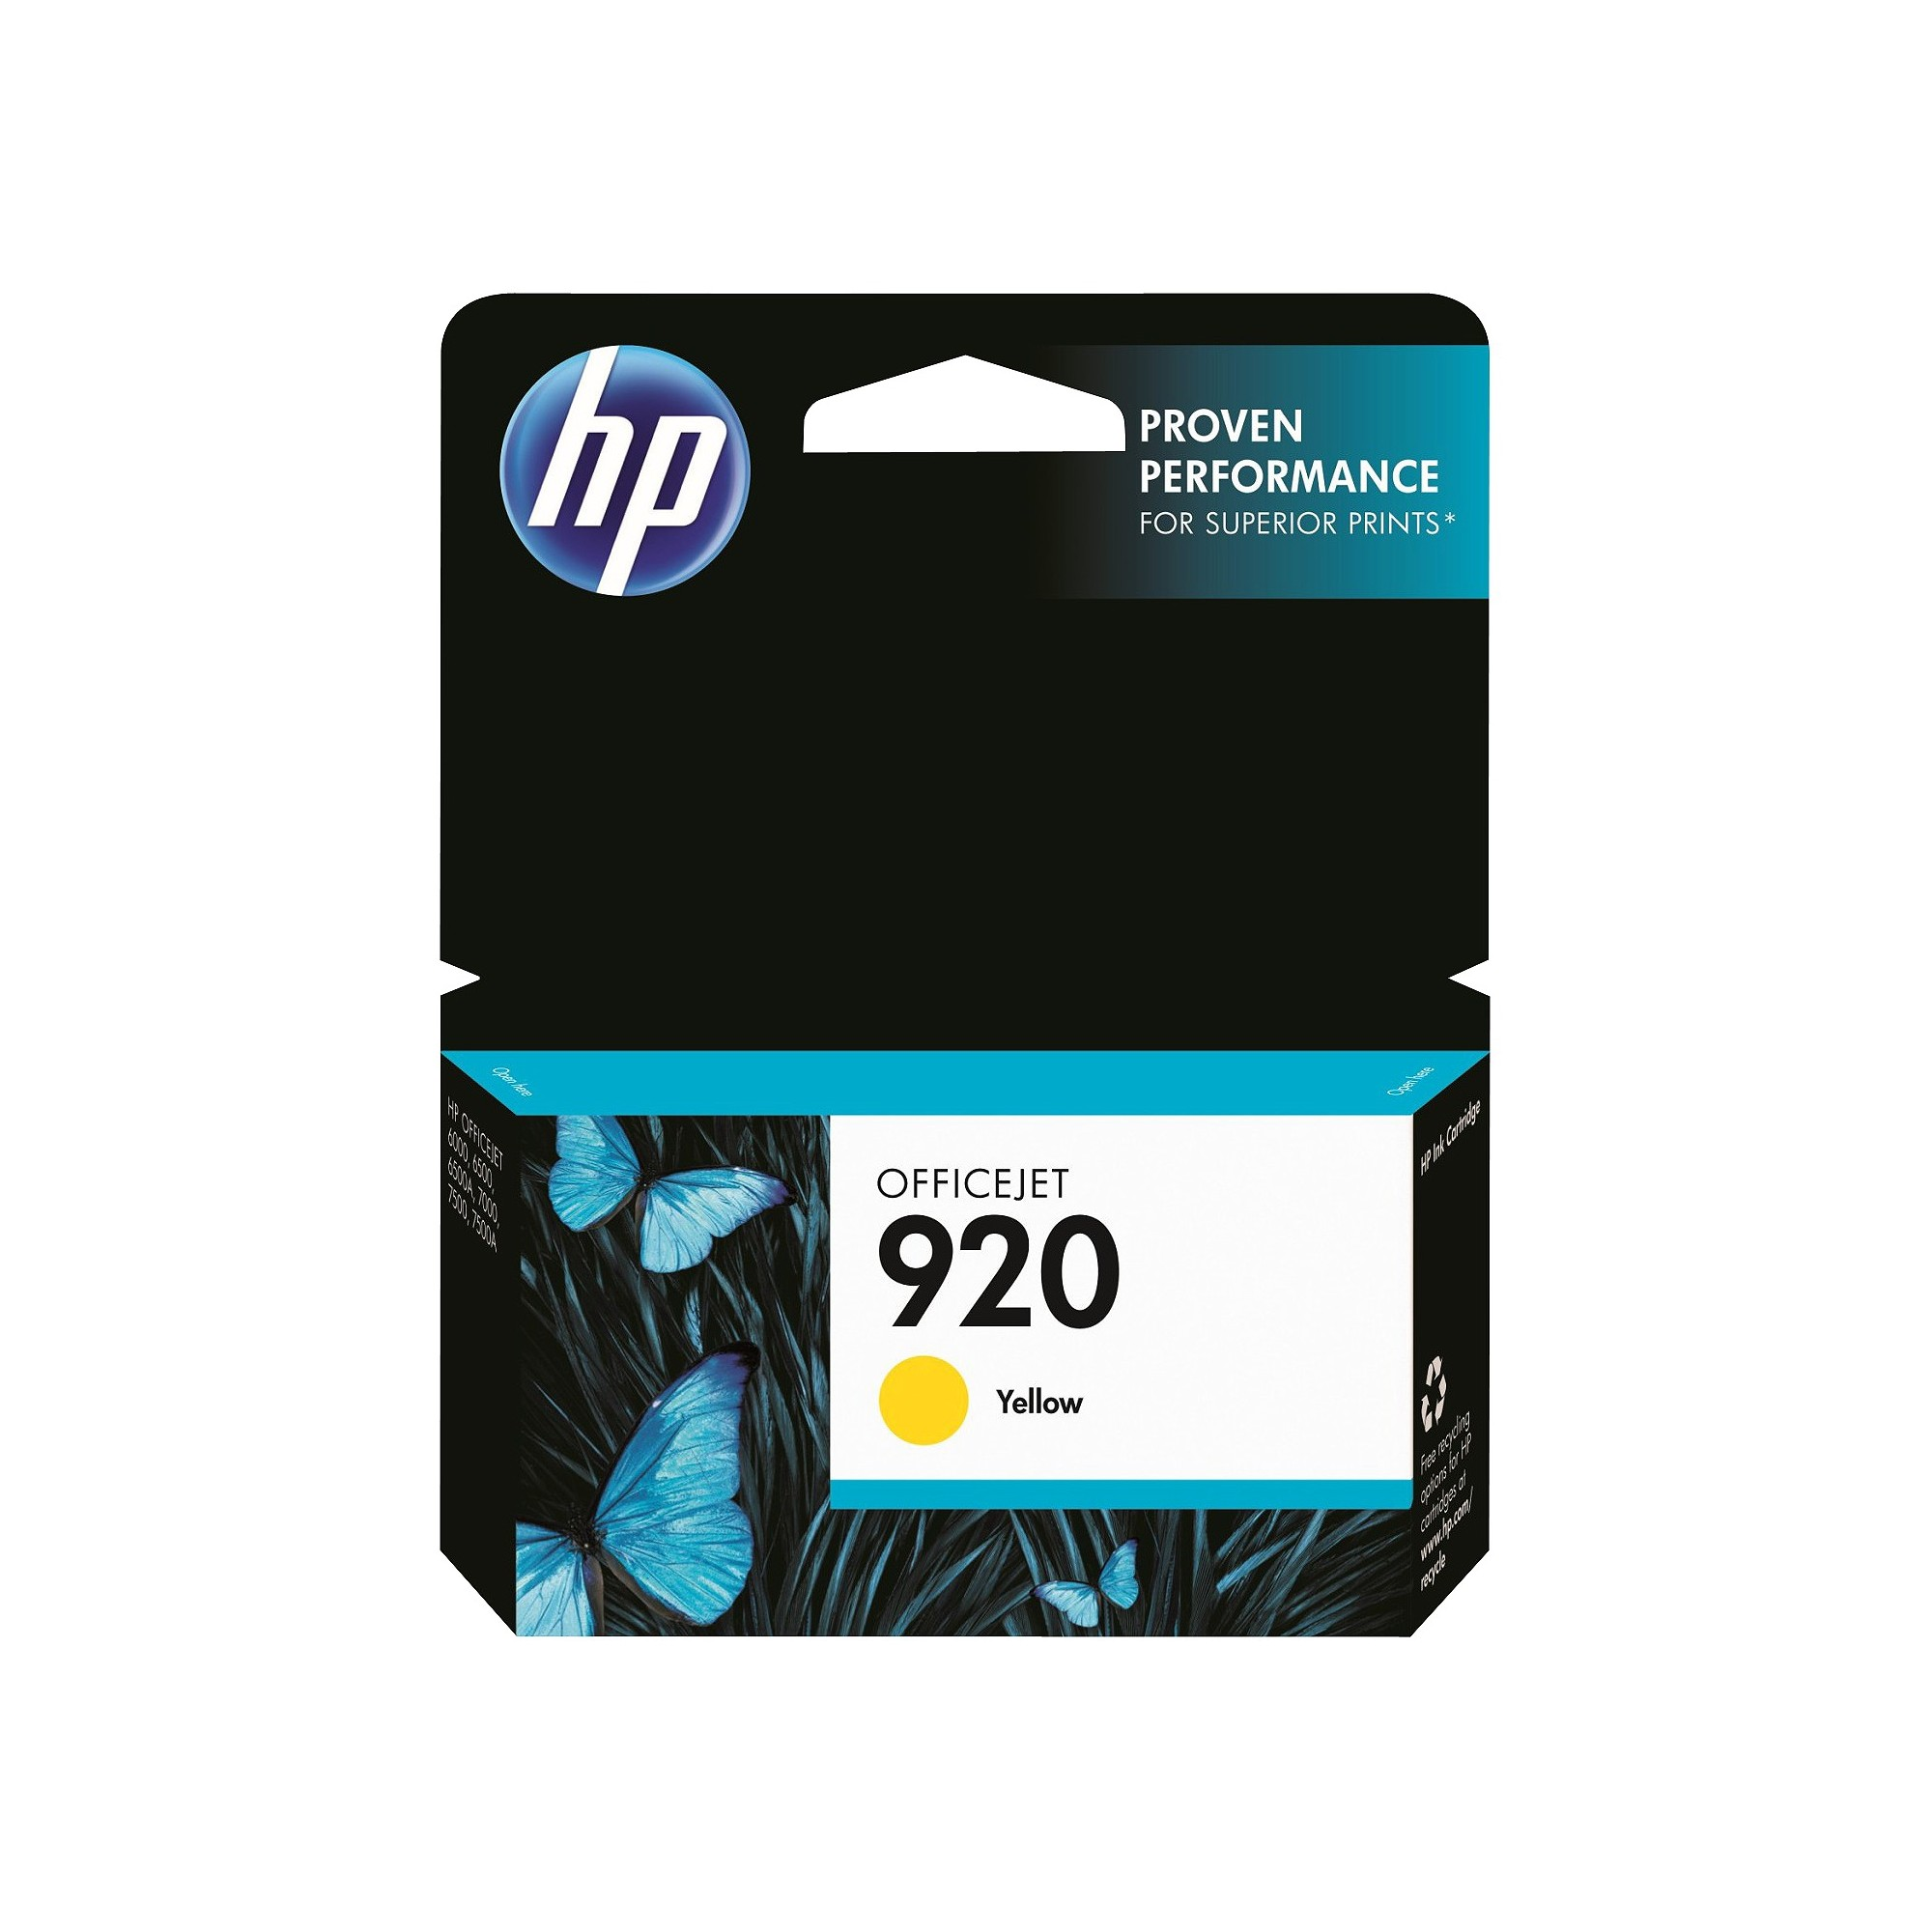 Hp 920 Single Officejet Printer Ink Cartridge Yellow Ch636an